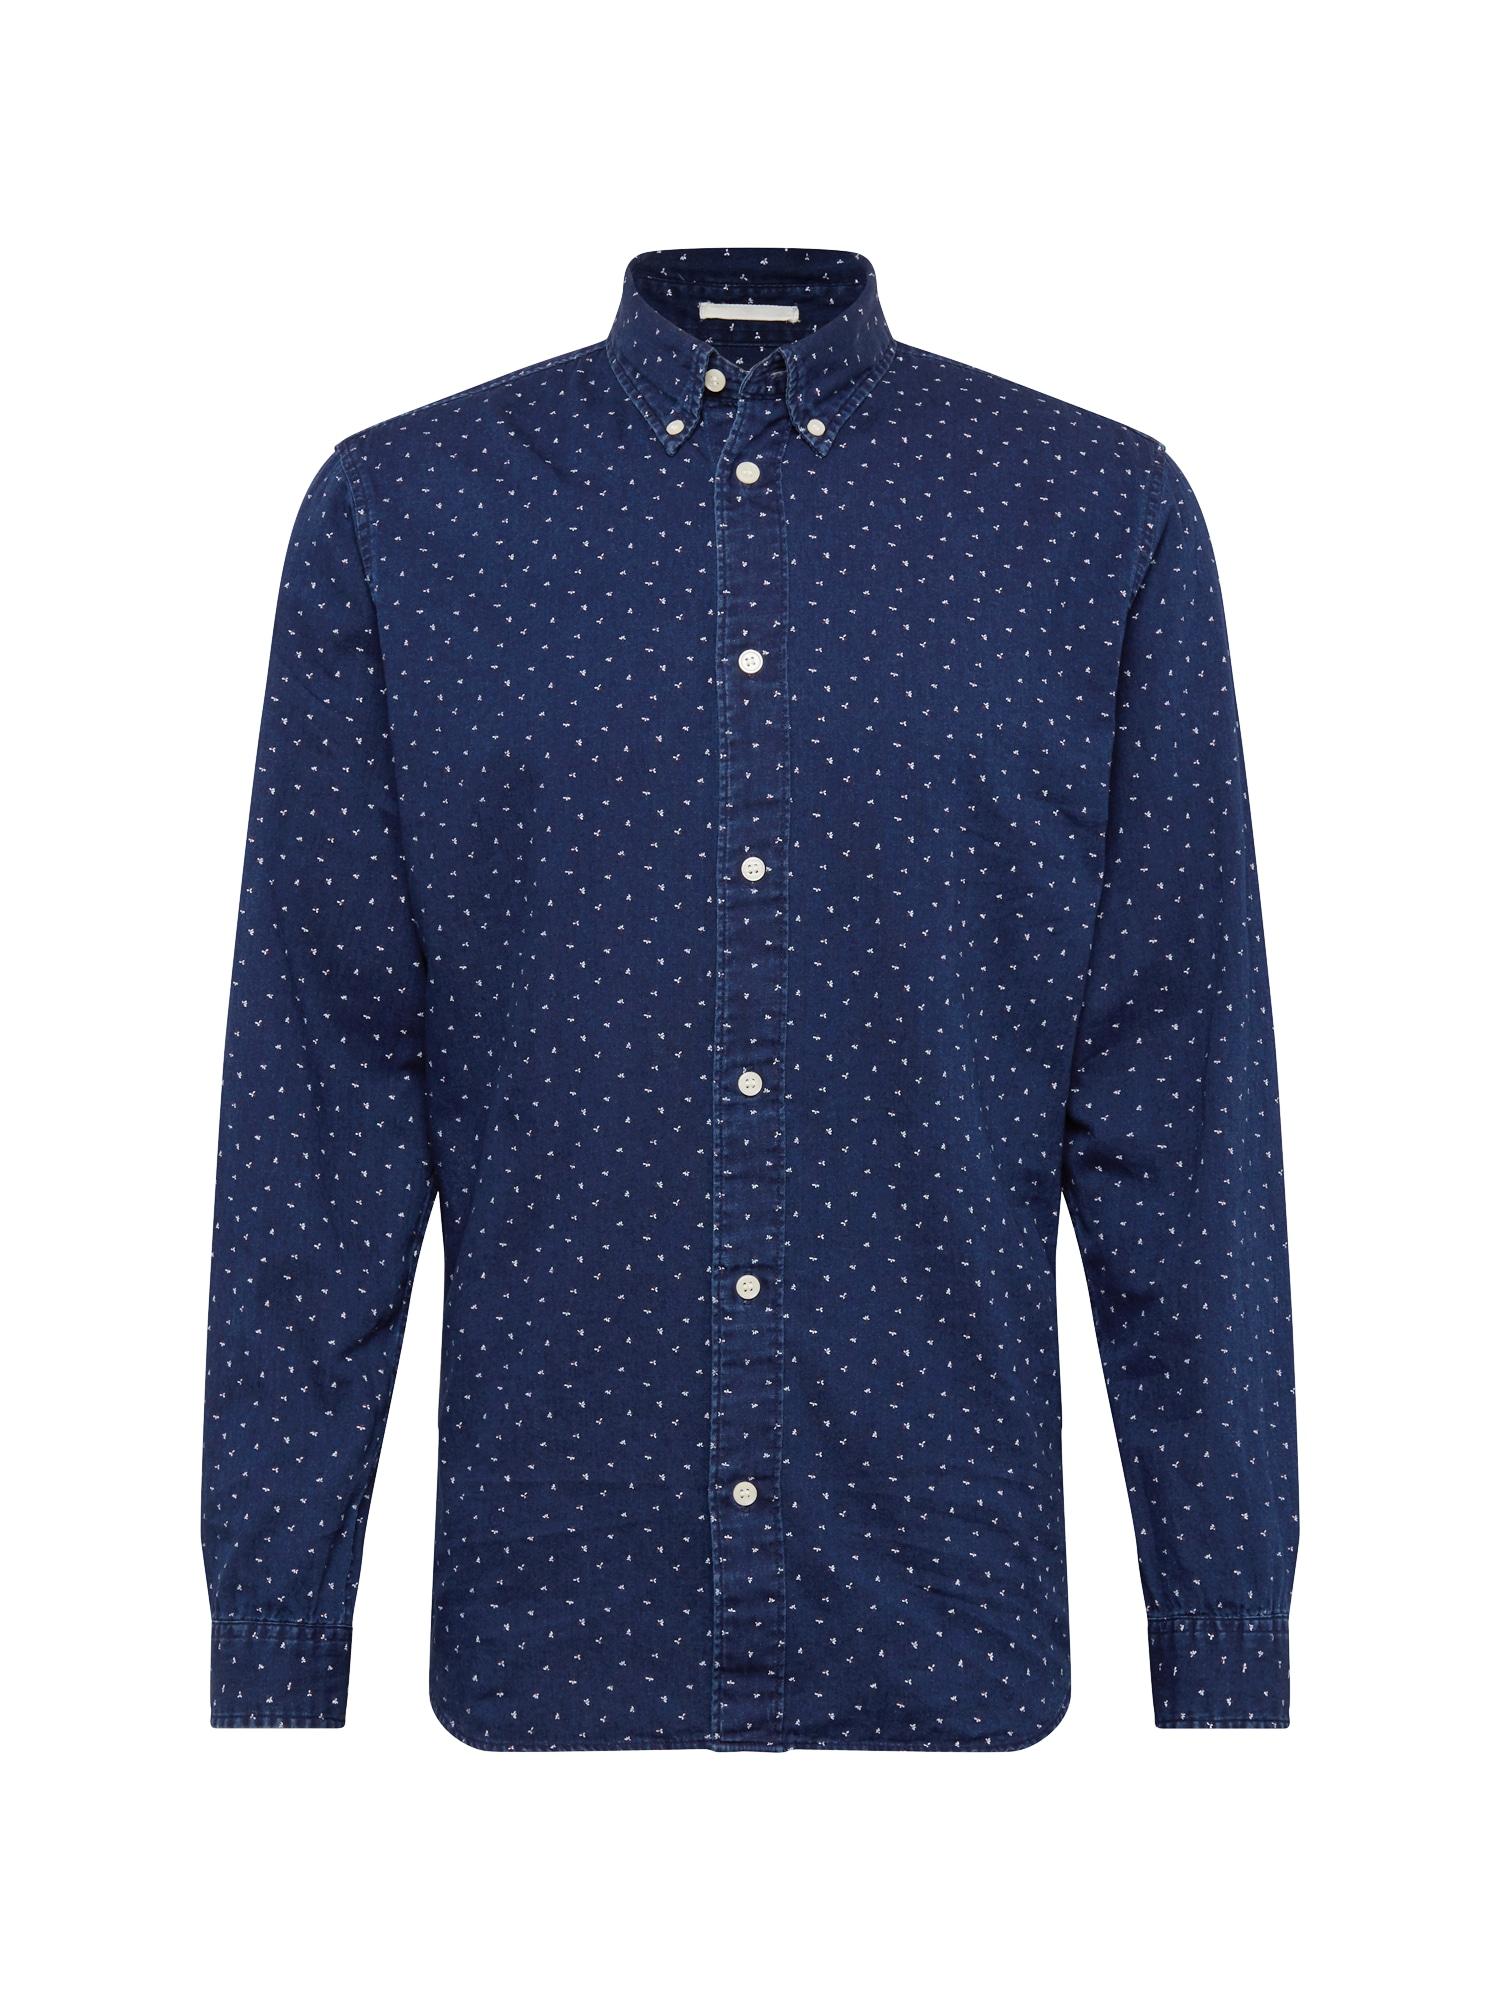 Košile SLIMNOLAN-PRE SHIRT LS MIX W tmavě modrá bílá SELECTED HOMME